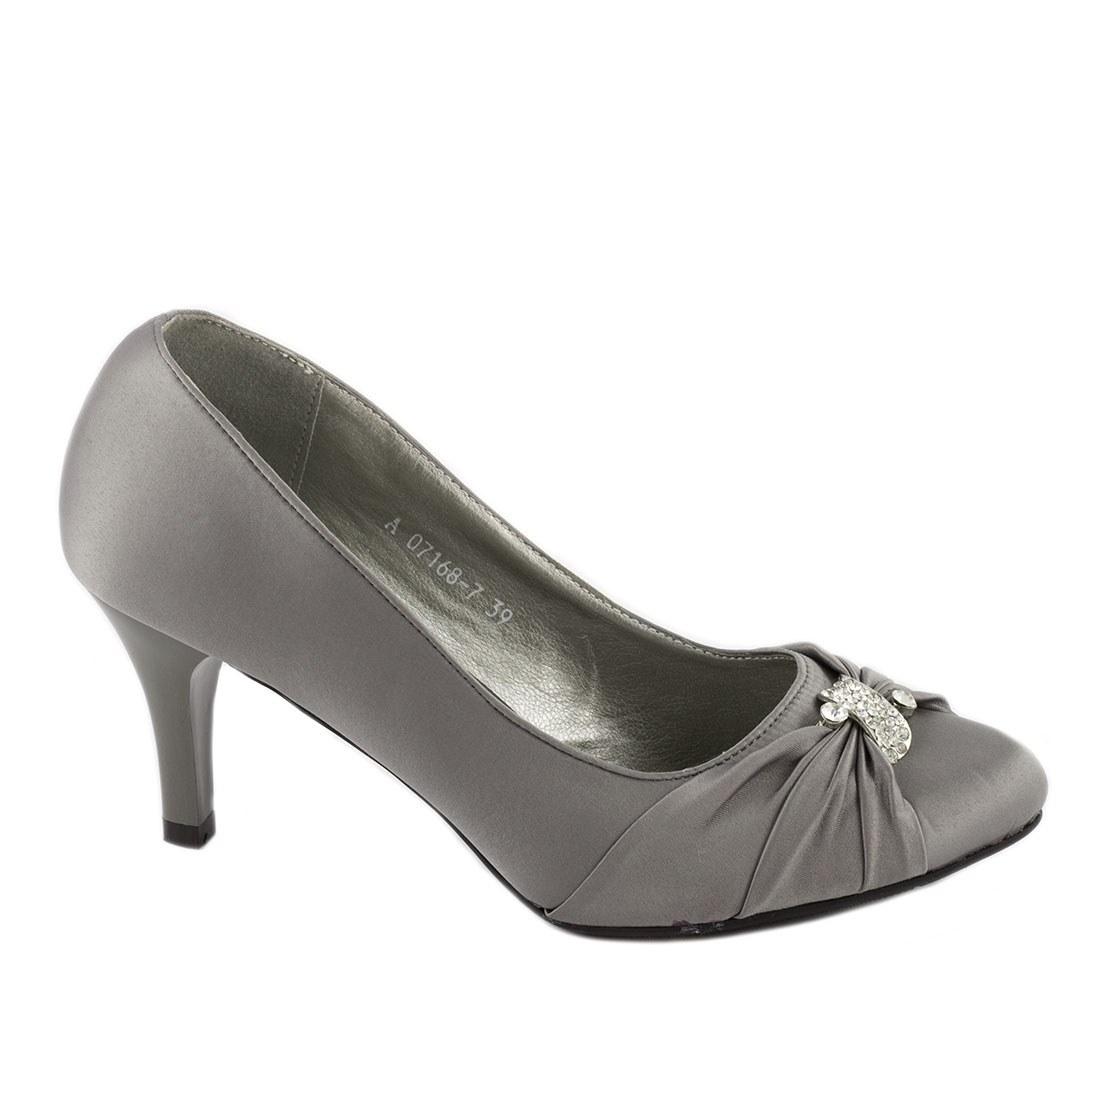 Pantofi dama cu toc A07168-7-GRI-OUTLET